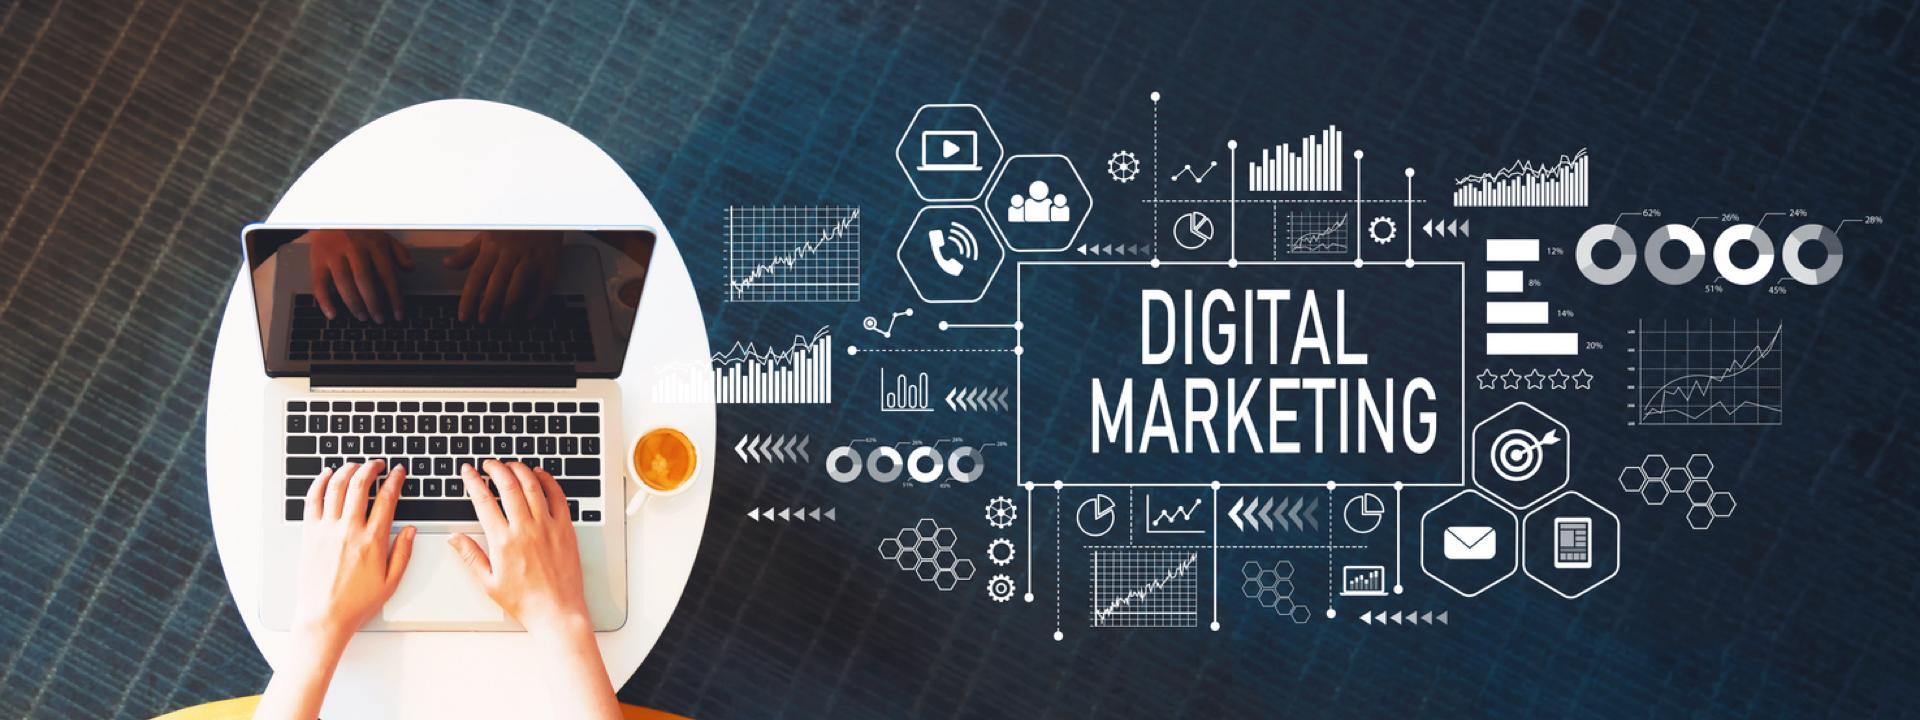 2021 Imperial - Digital Marketing: Customer Analytics & Engagement